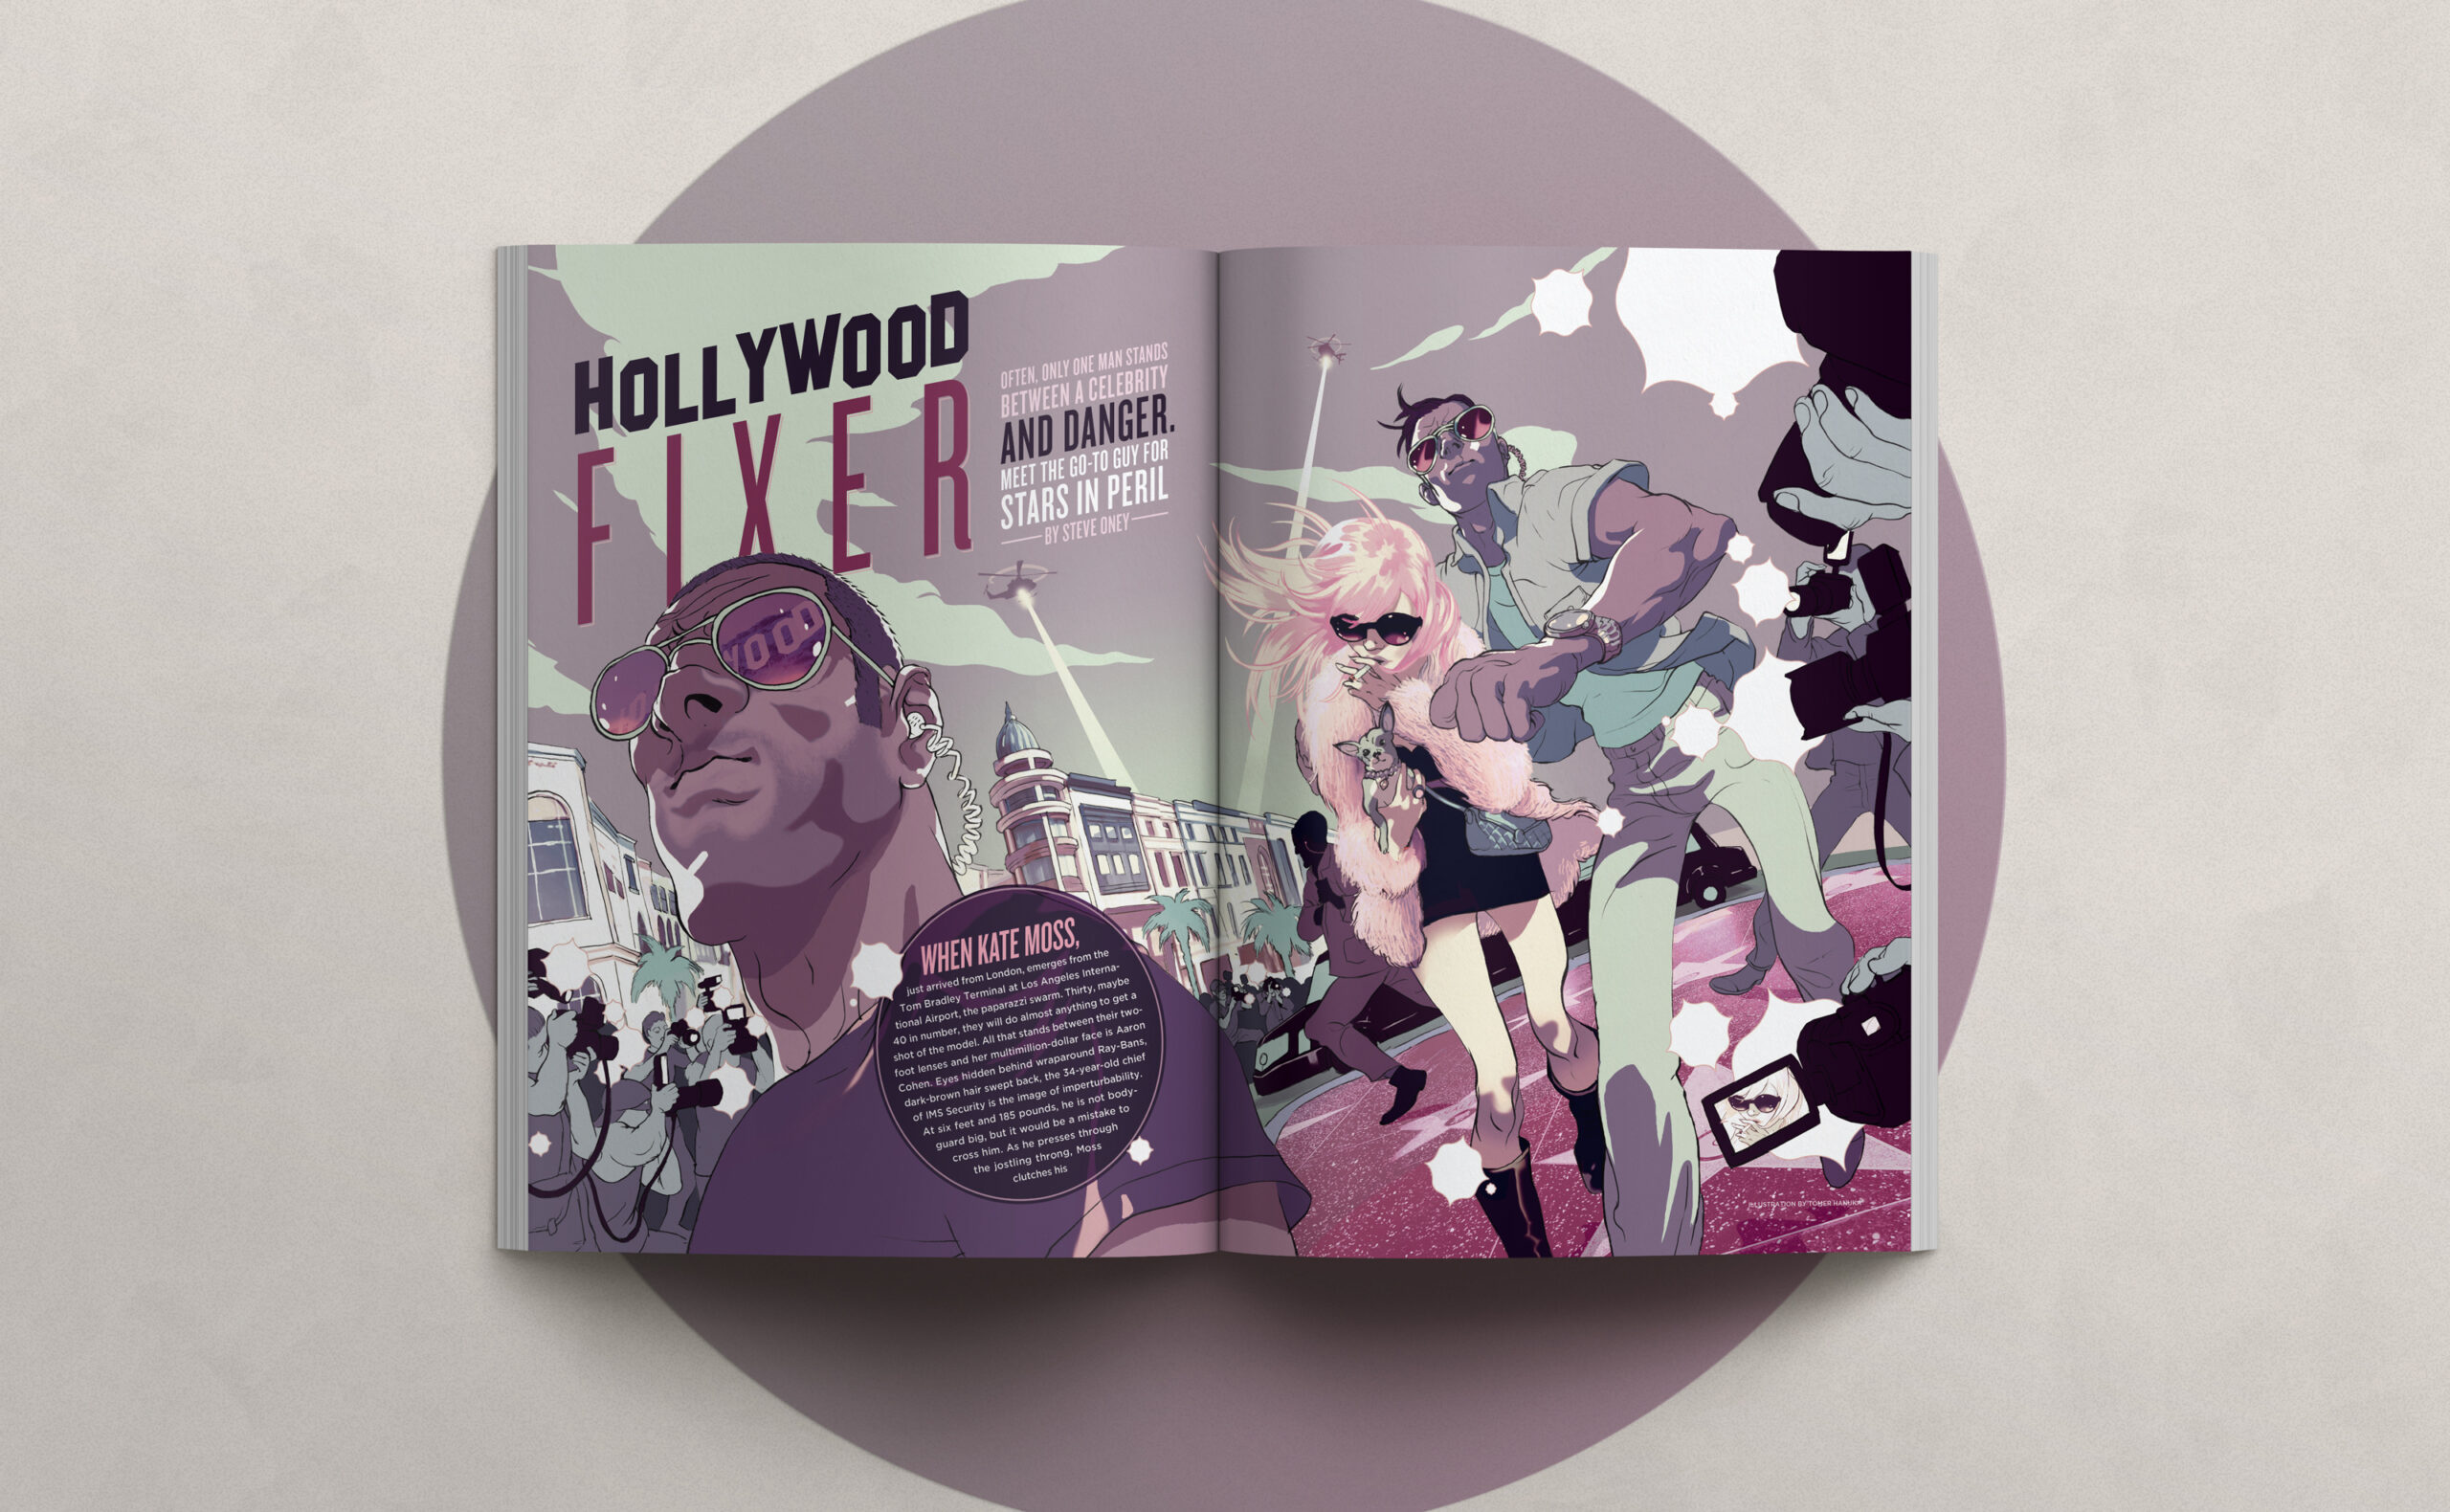 PLAYBOY_Scene_102010_Cody_Tilson_Hollywood_Fixer